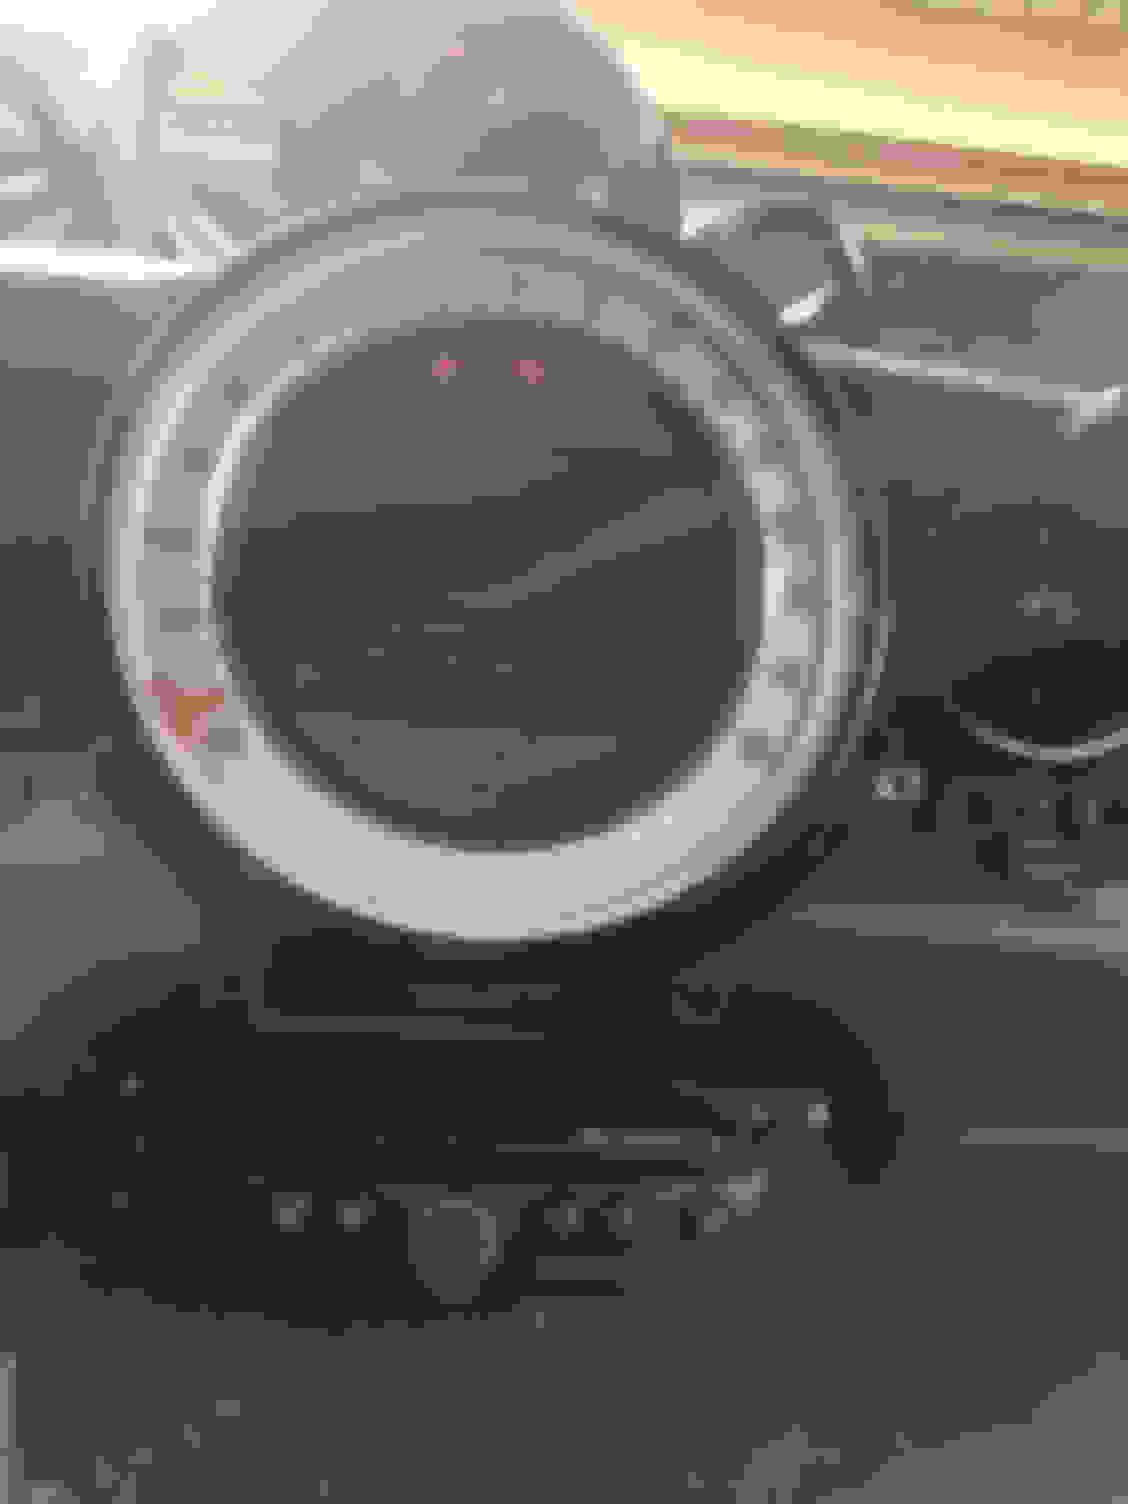 Navigation & Audio OEM navigation upgrade-Hopefully a how-to guide